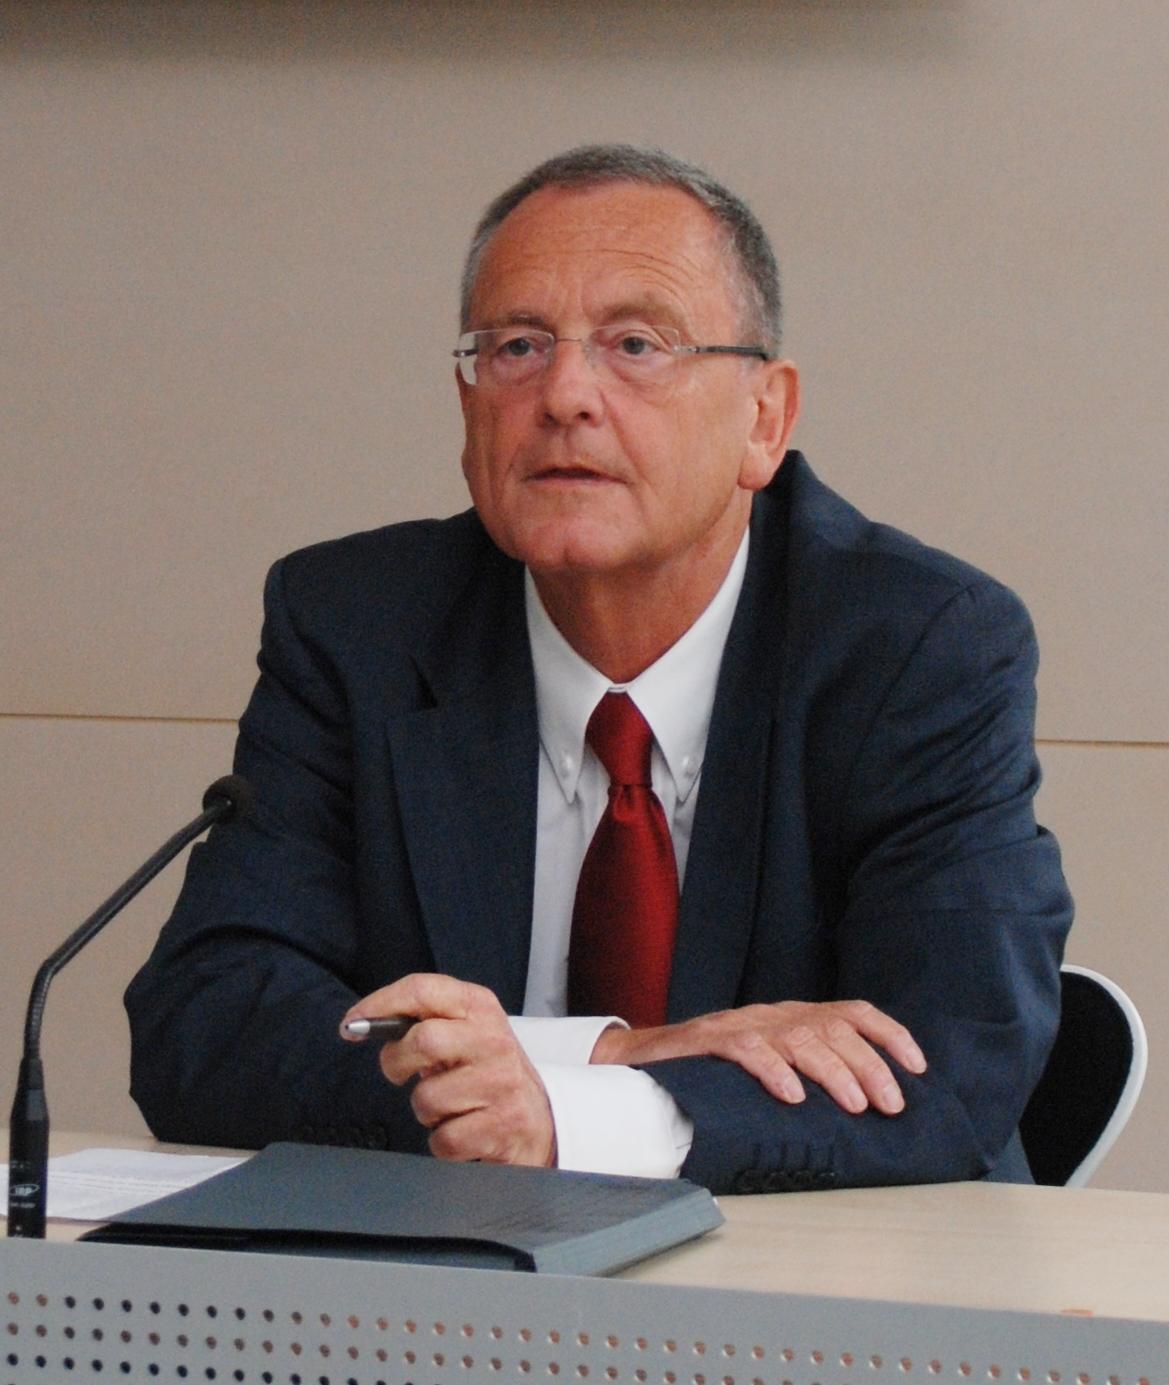 Gerhard Besier in June 2009